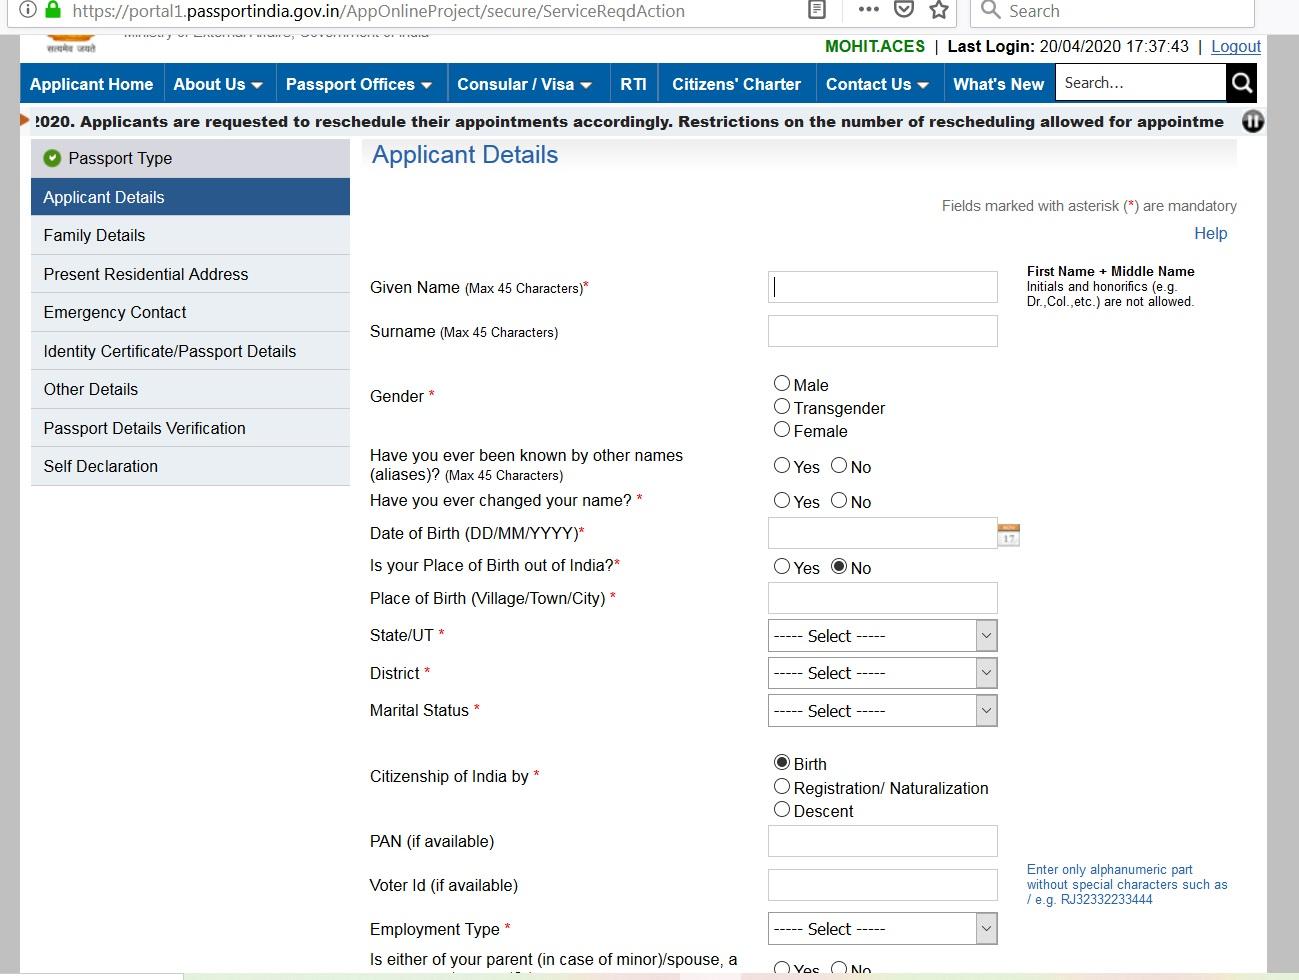 applicant-details